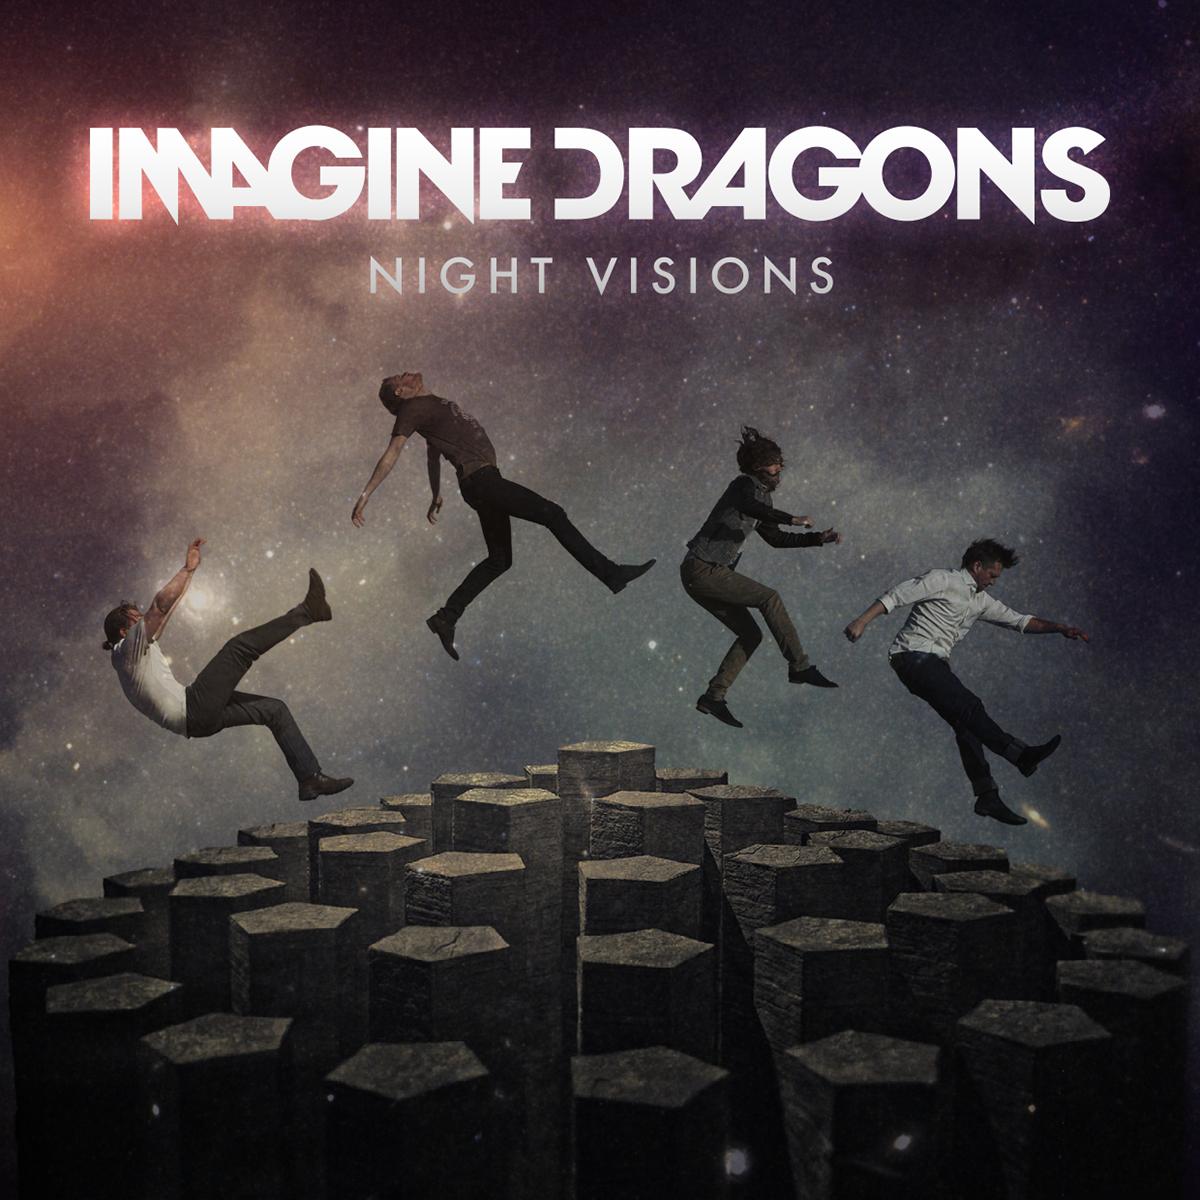 Imagine Dragons Night Visions Wallpaper Download